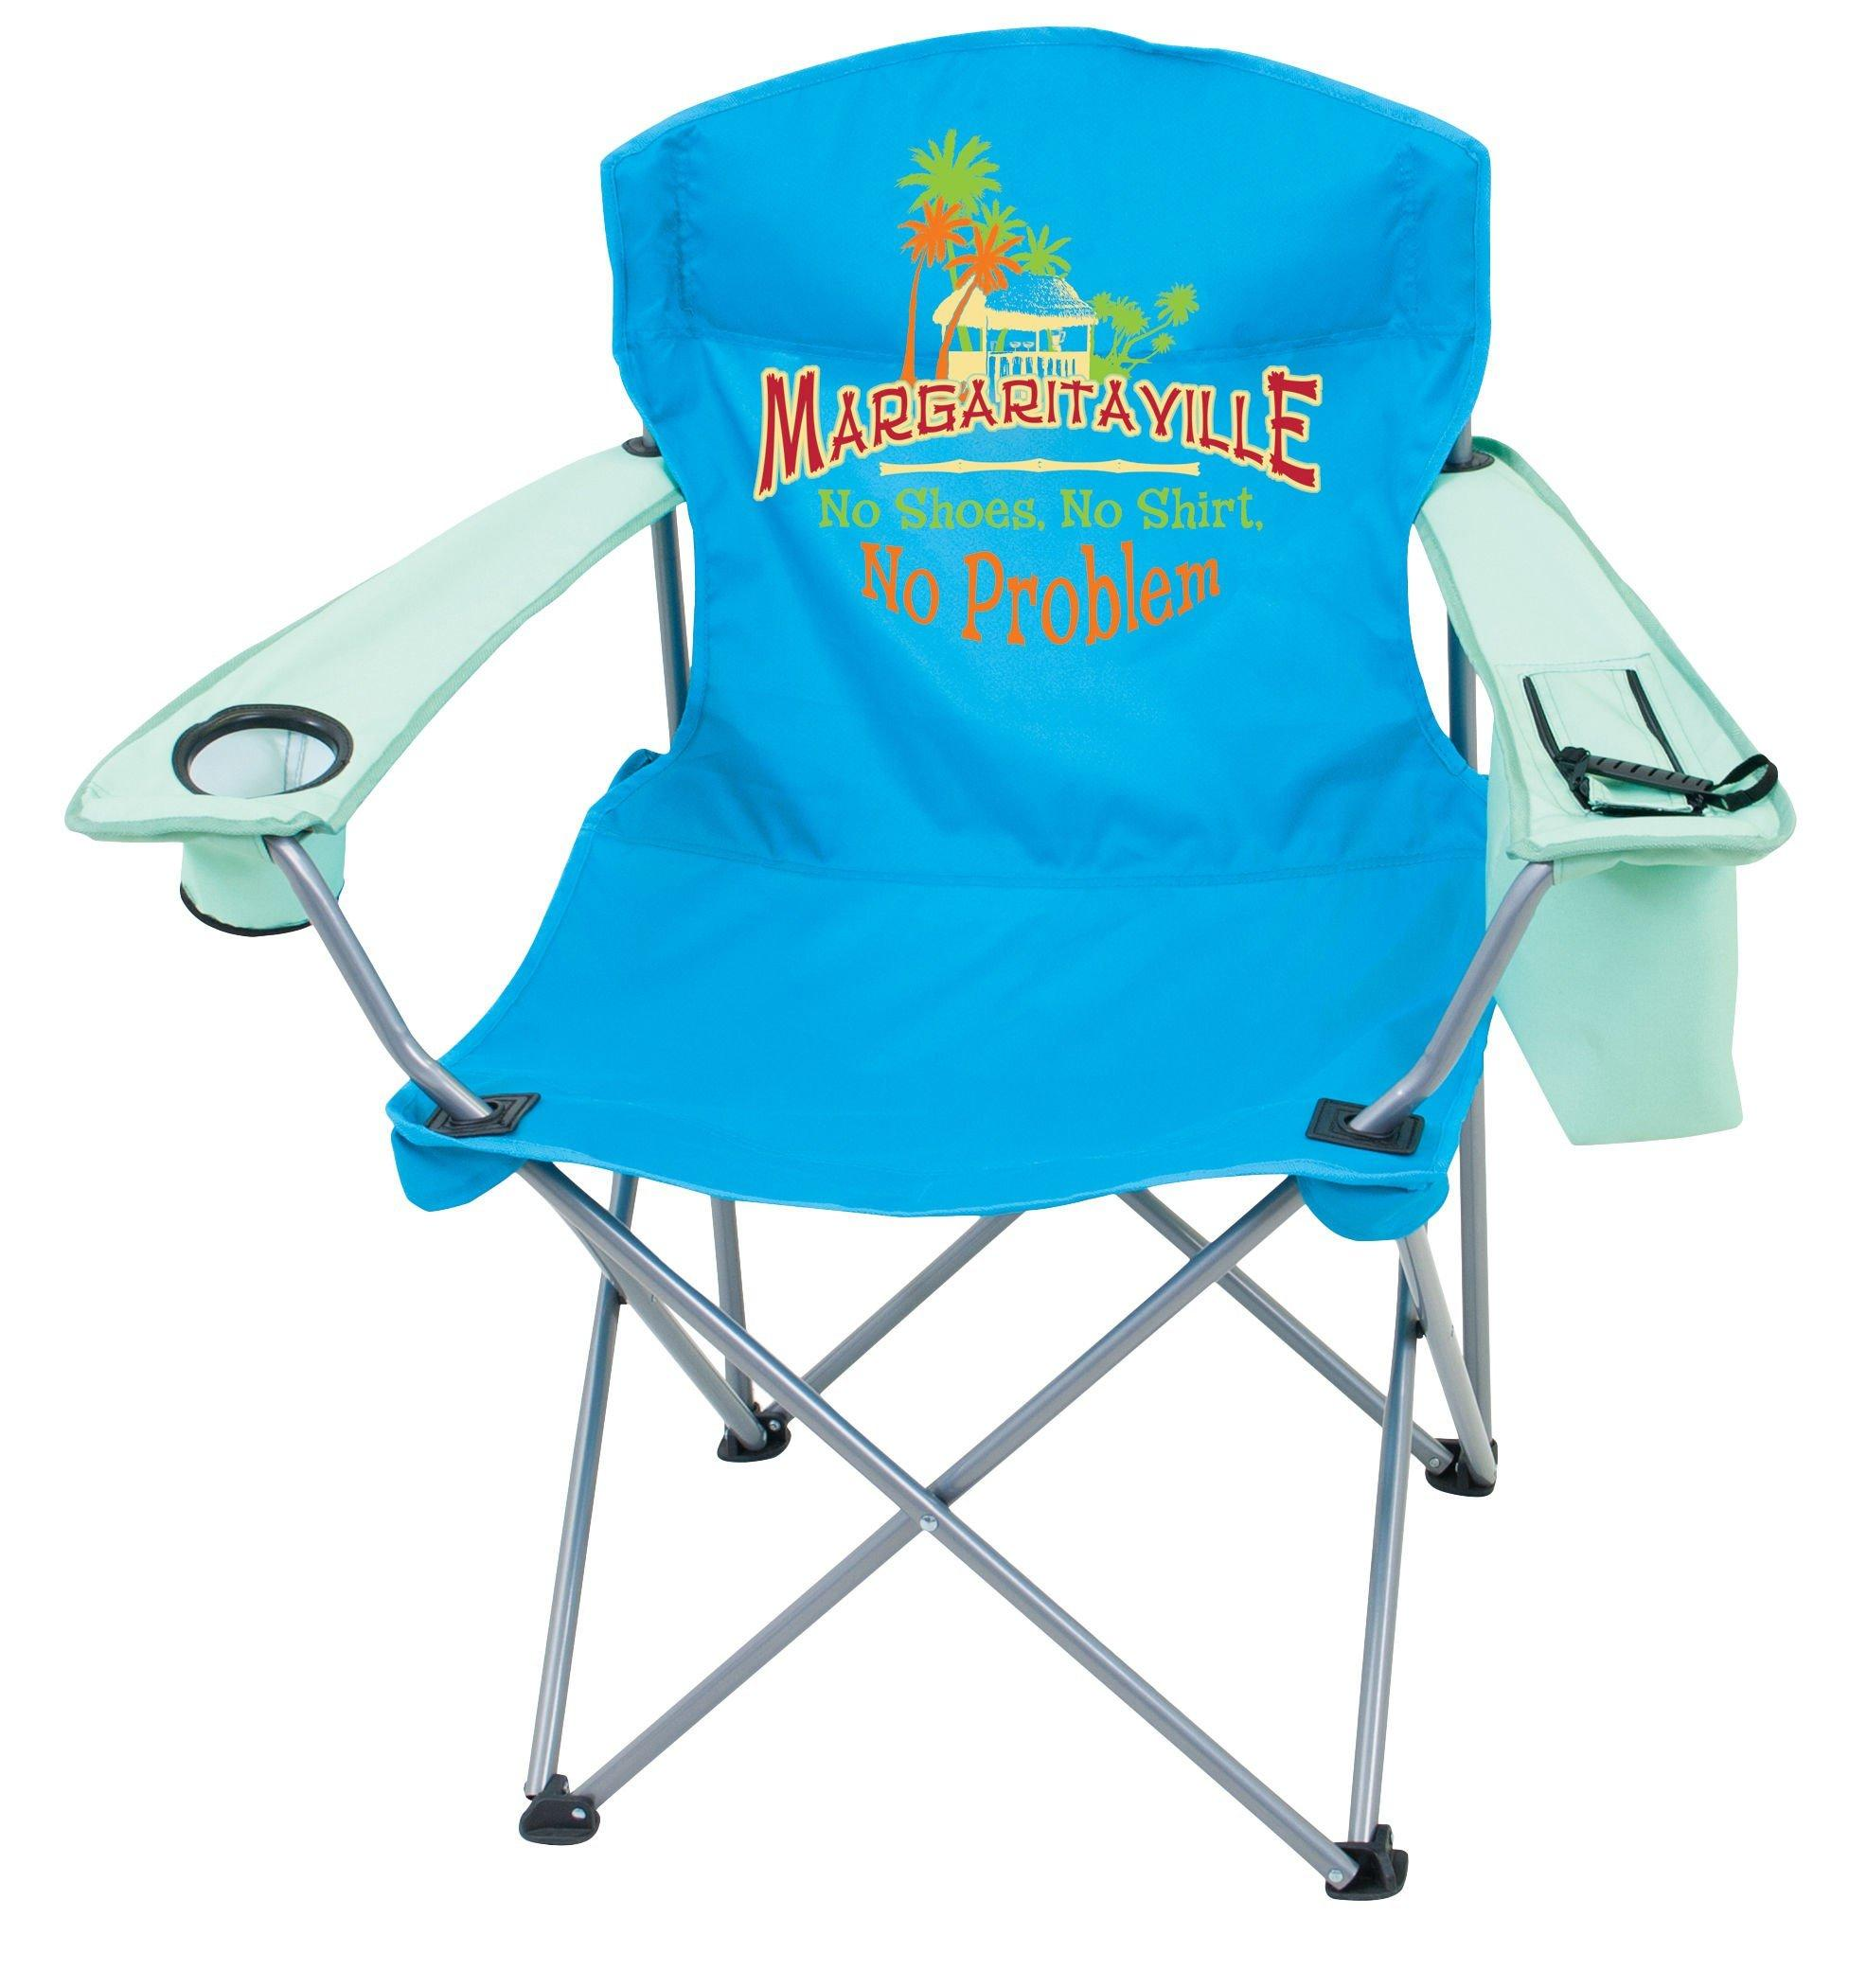 Margaritaville No Problem Folding Quad Chair | Bealls Florida